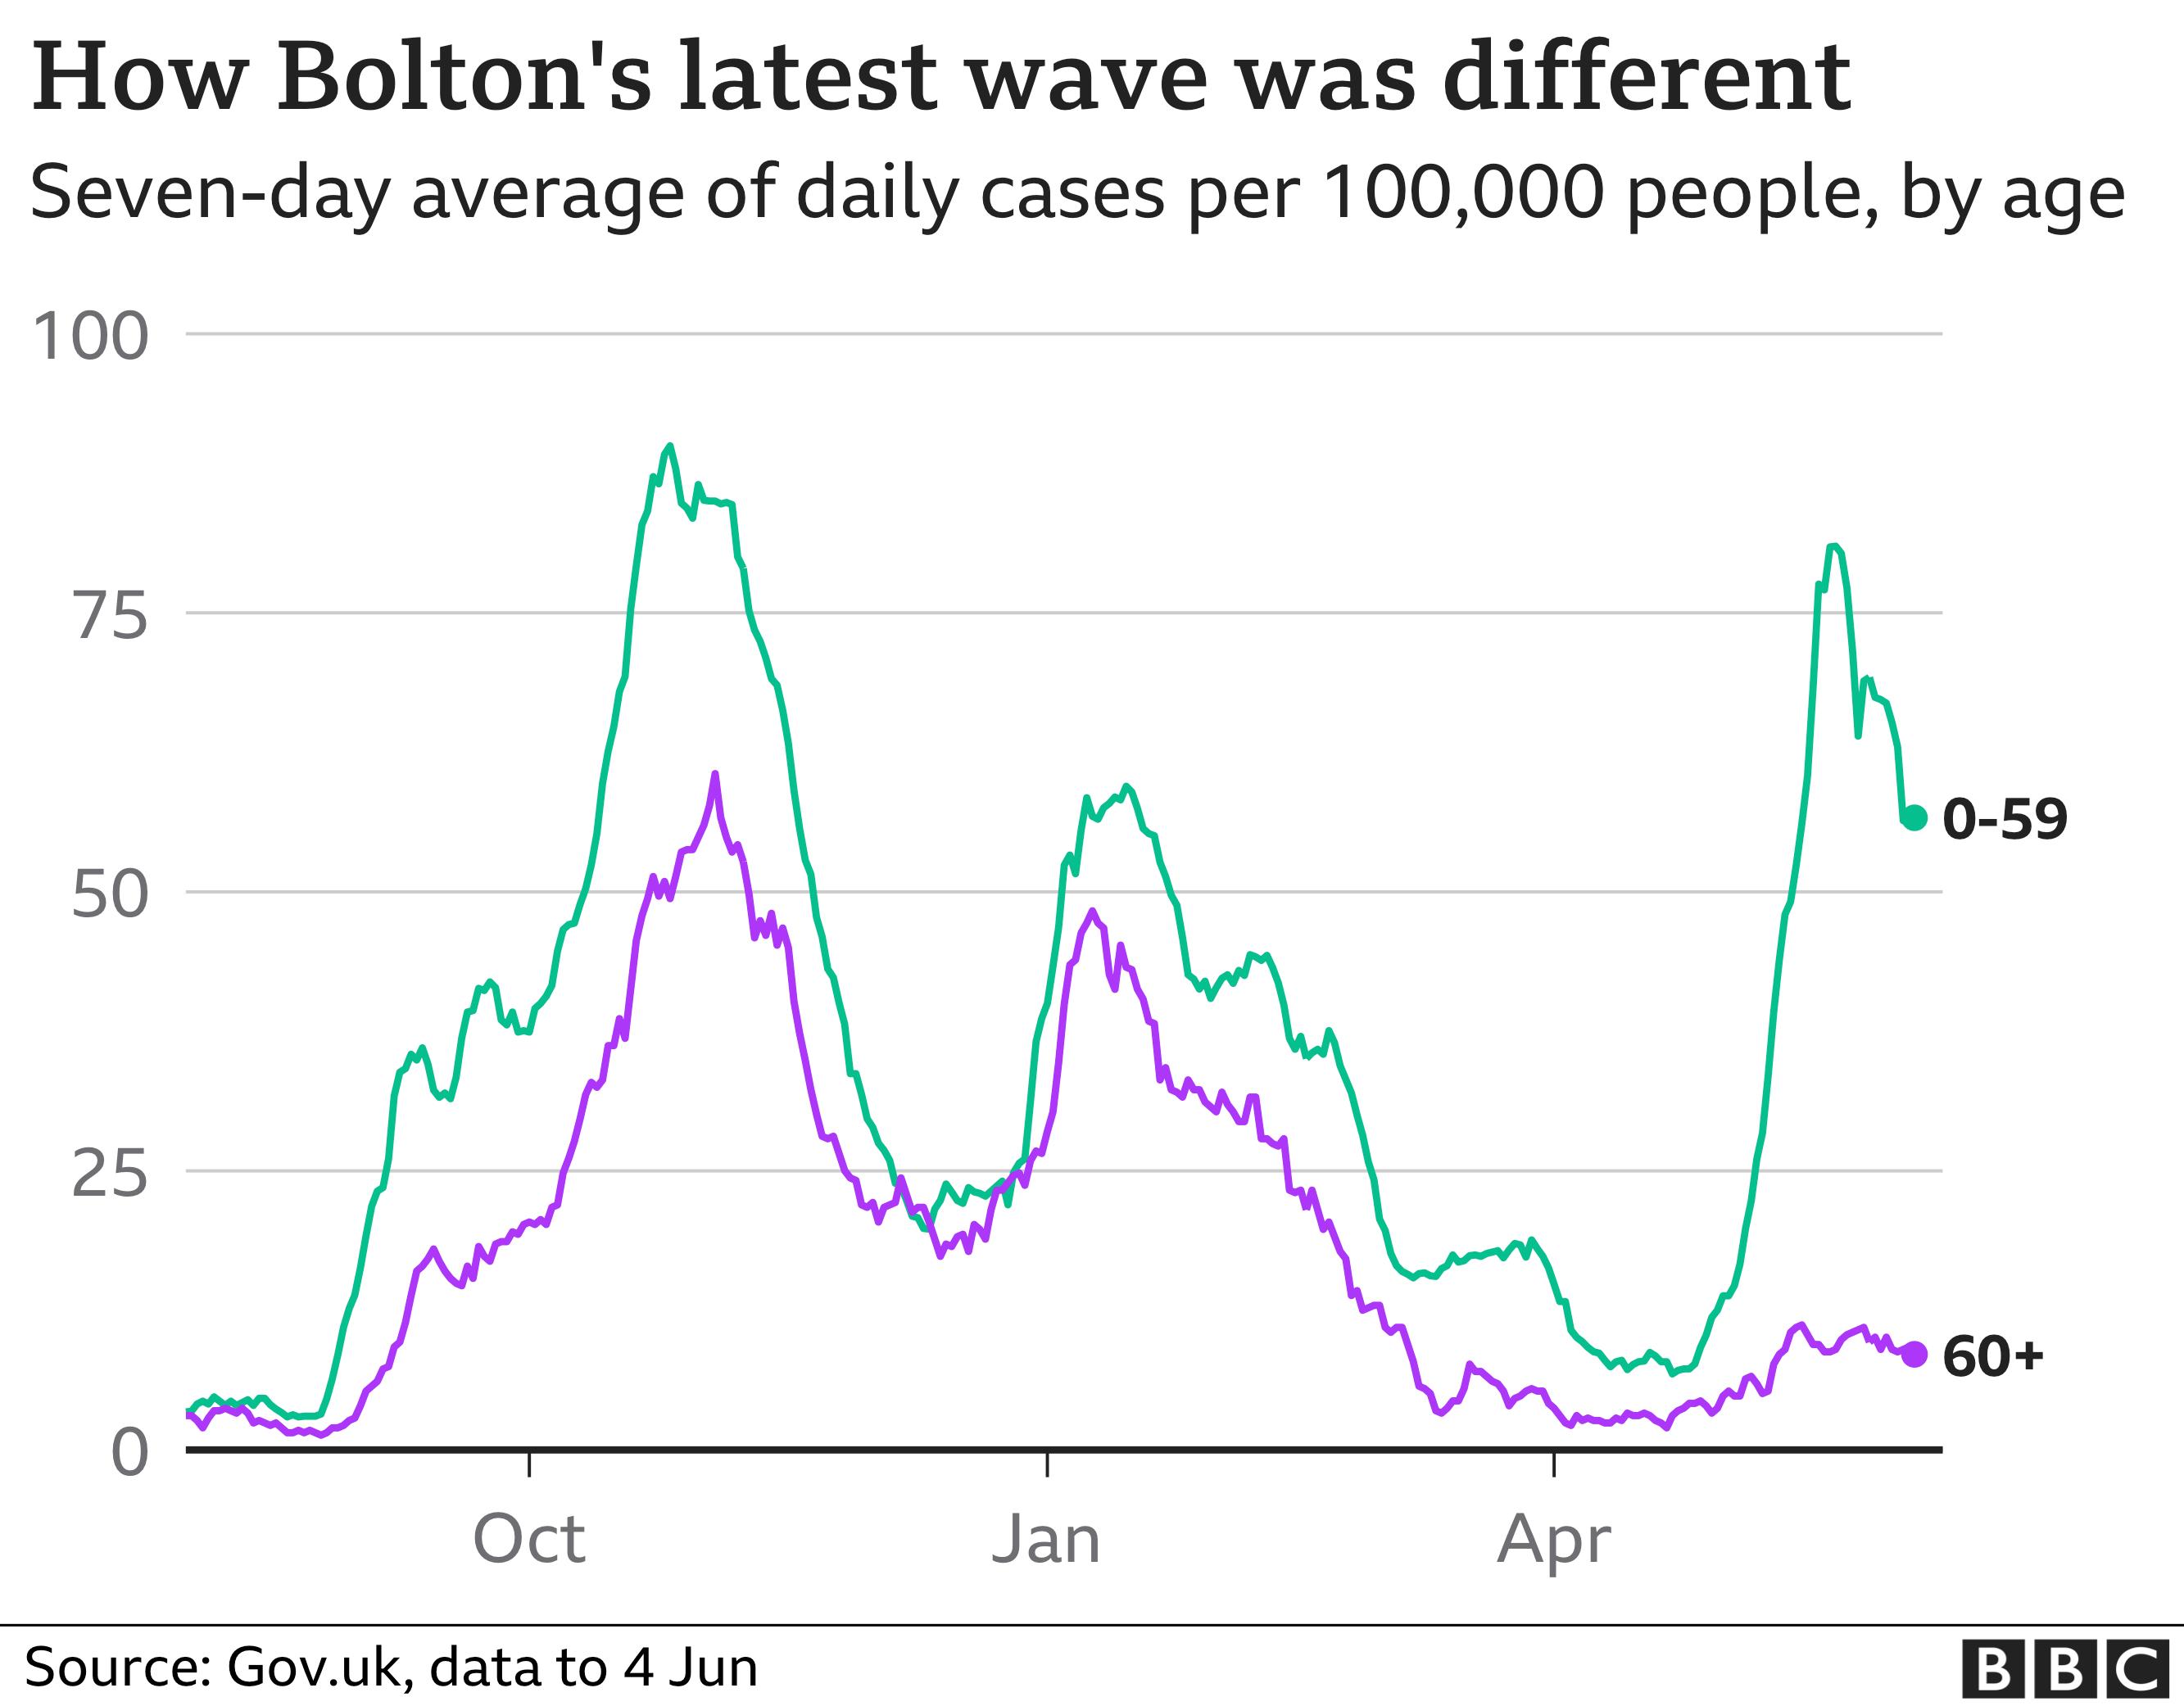 Cases in Bolton